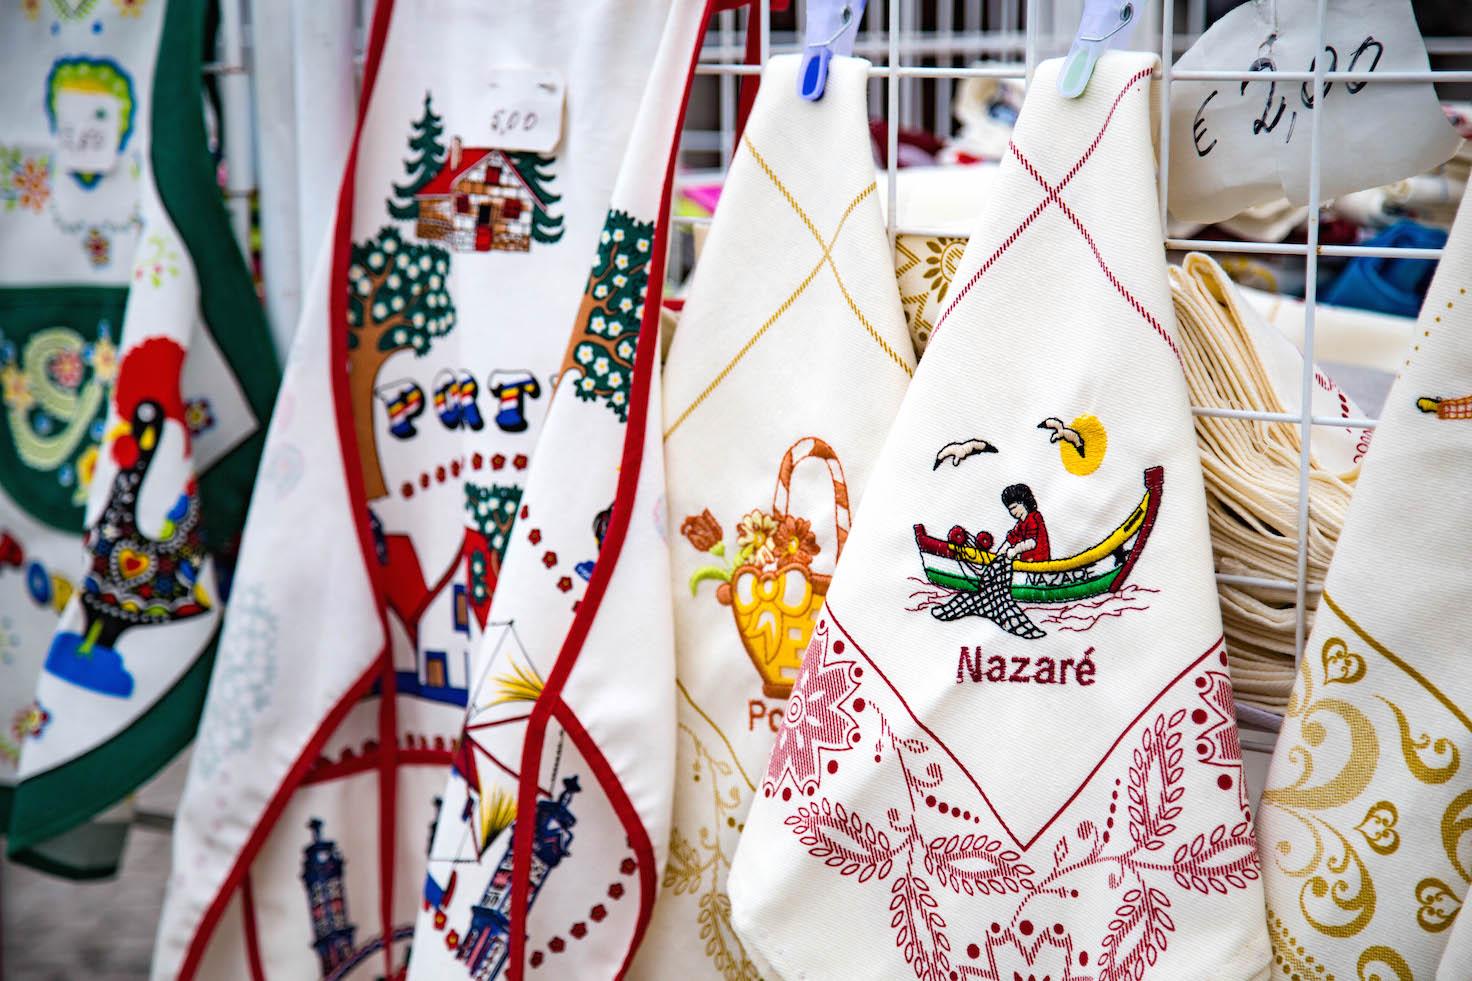 nazare-seven-skirts-portugal-moments-of-yugen-travel-blog_07